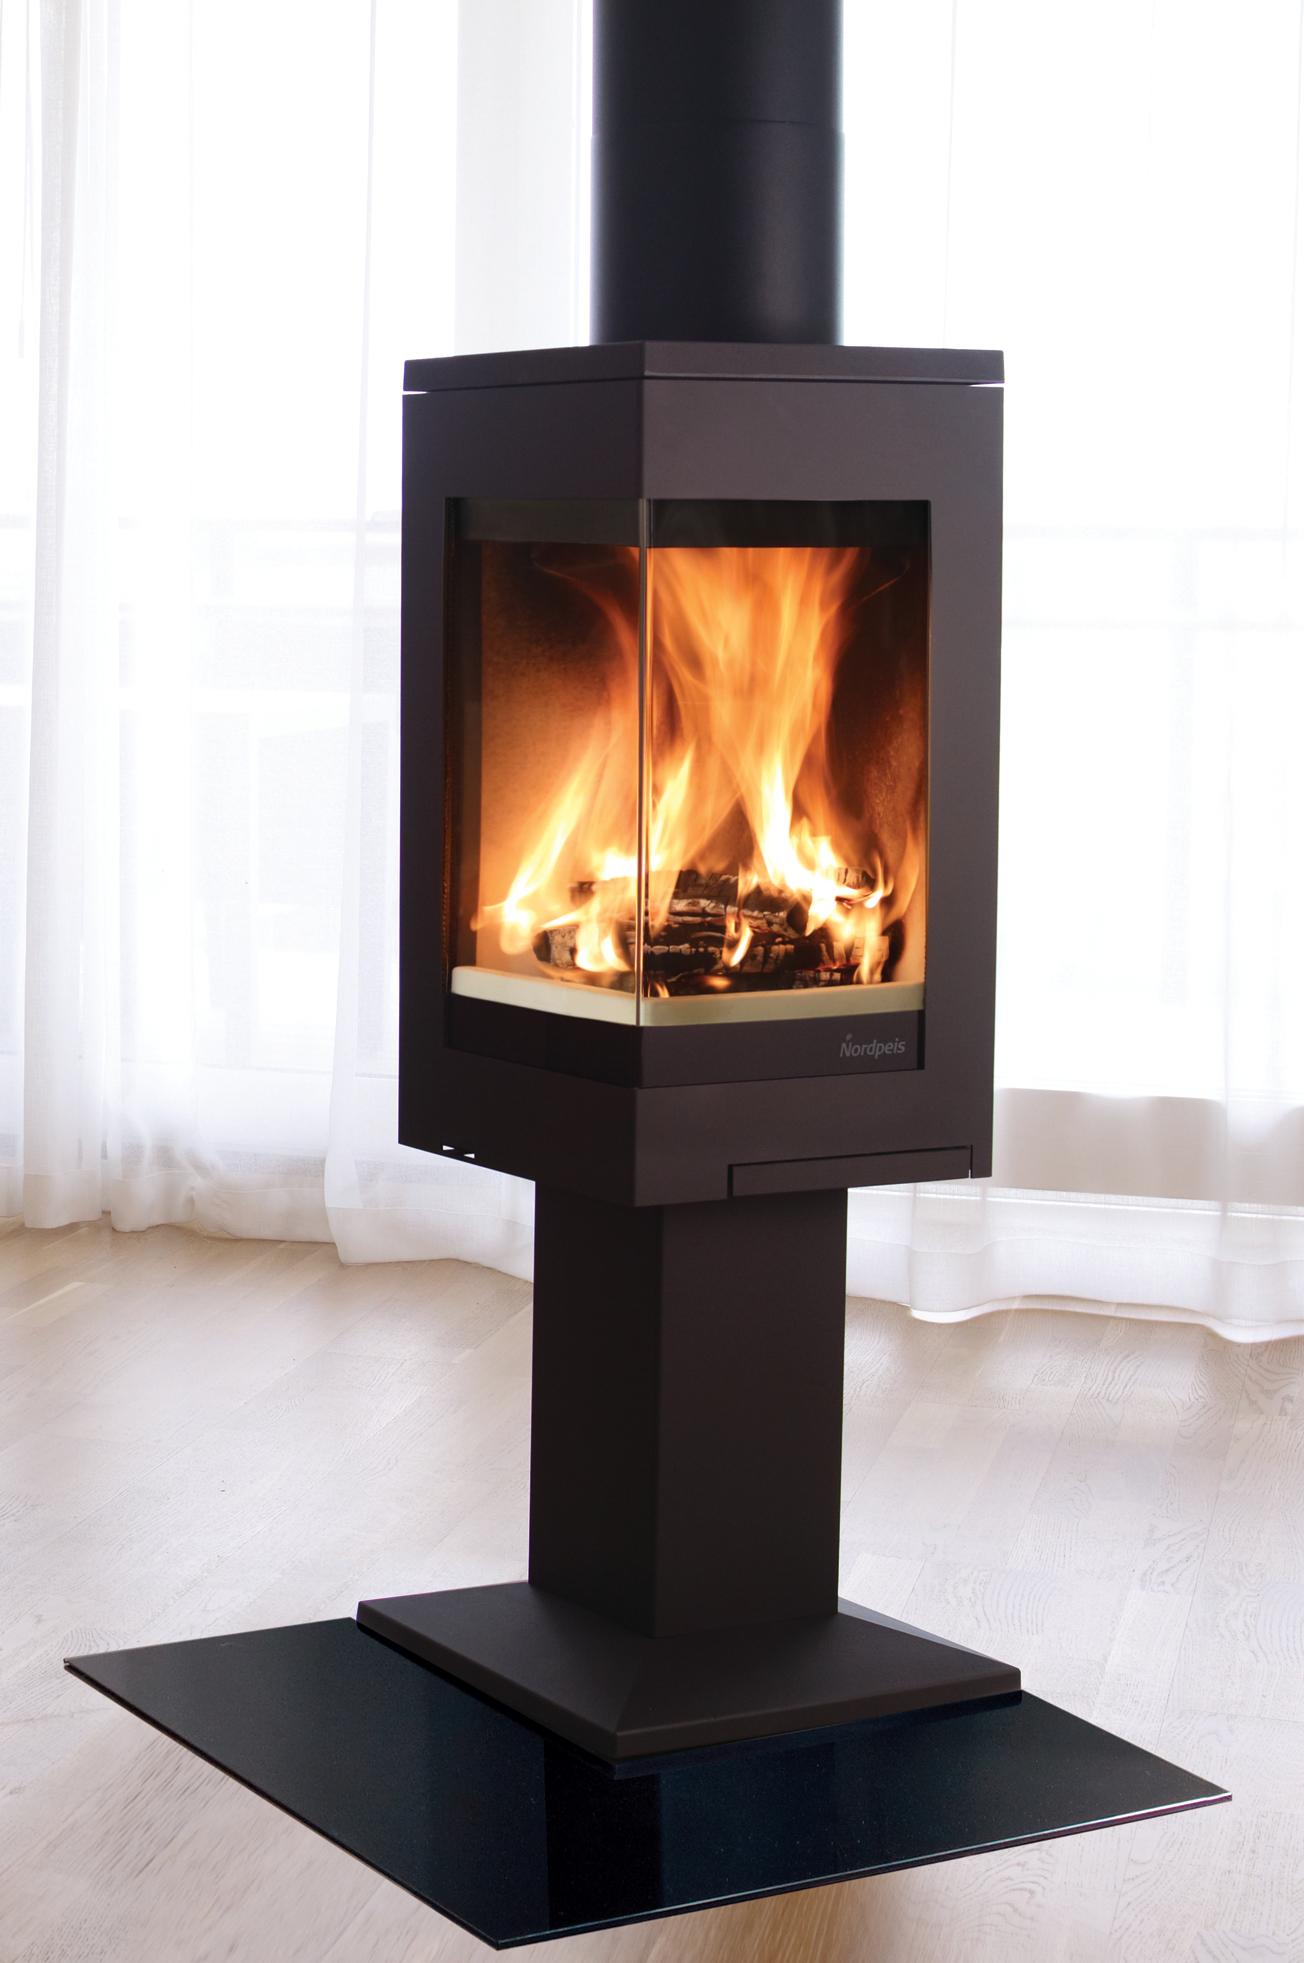 Nordpeis Quadro 1 Wood Burning Stove With Pedestal Base